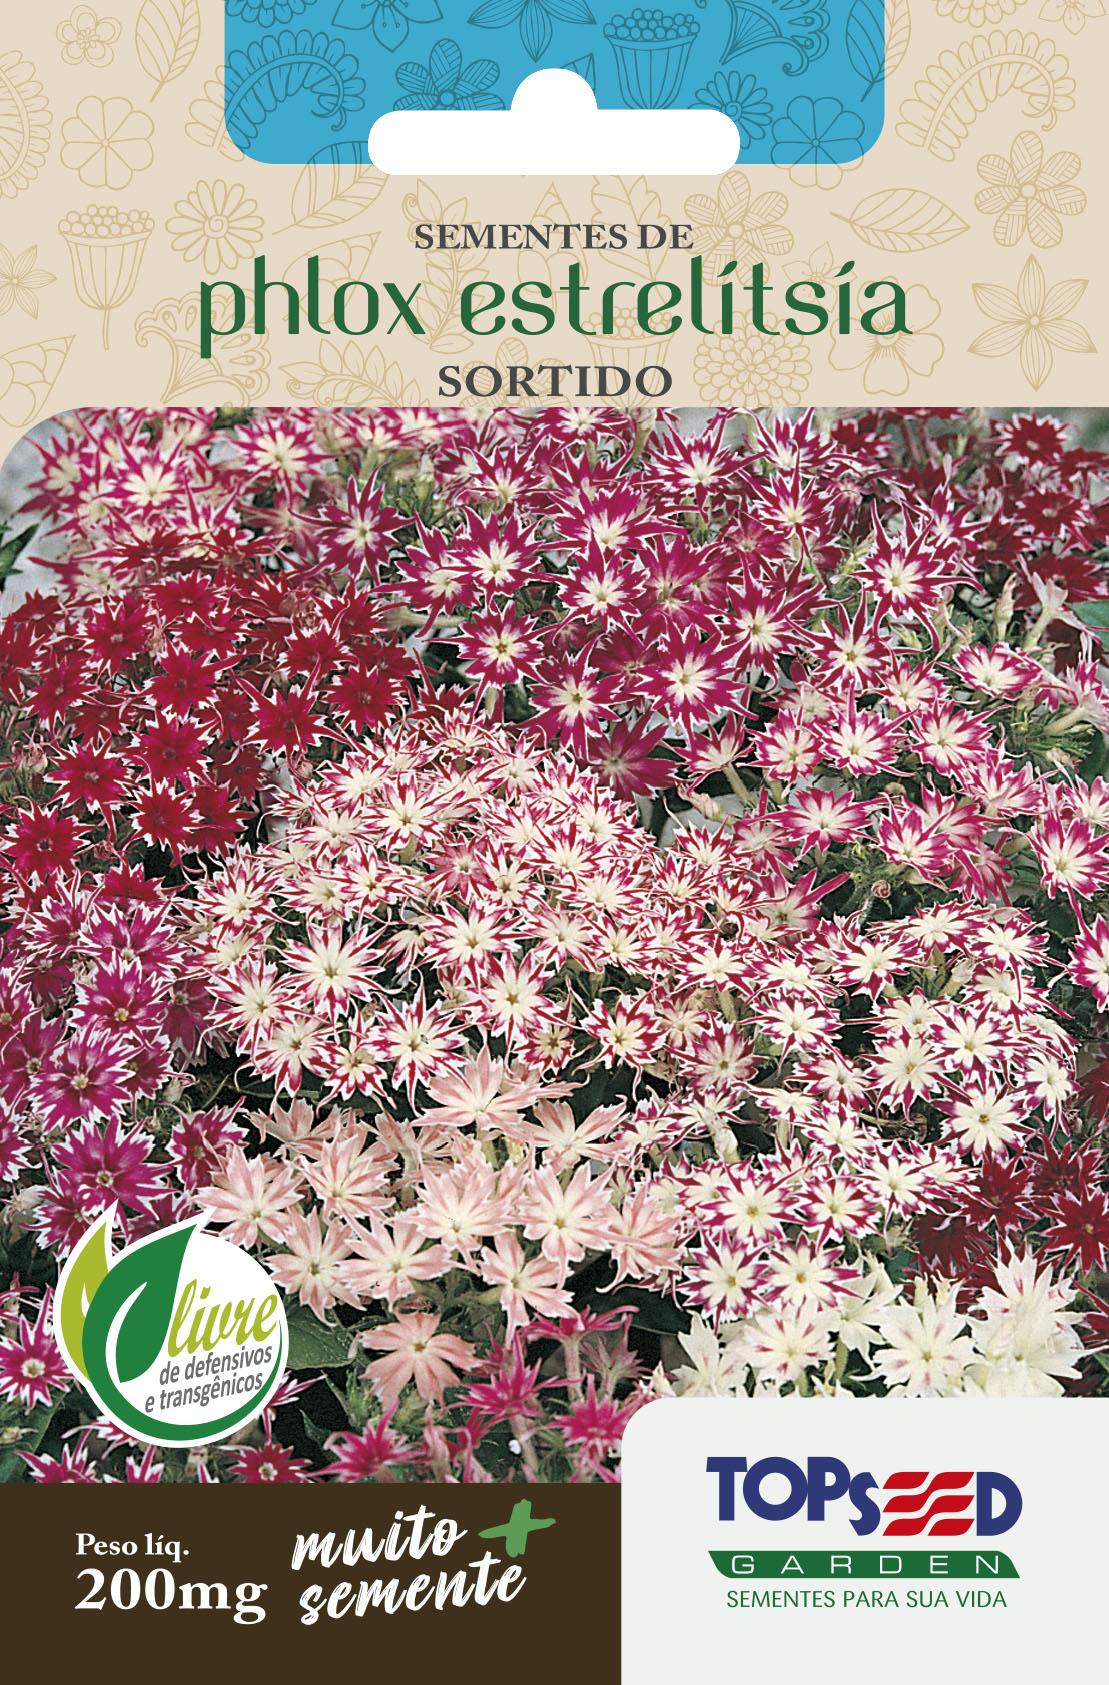 PHLOX ESTRELITSIA SORTIDO